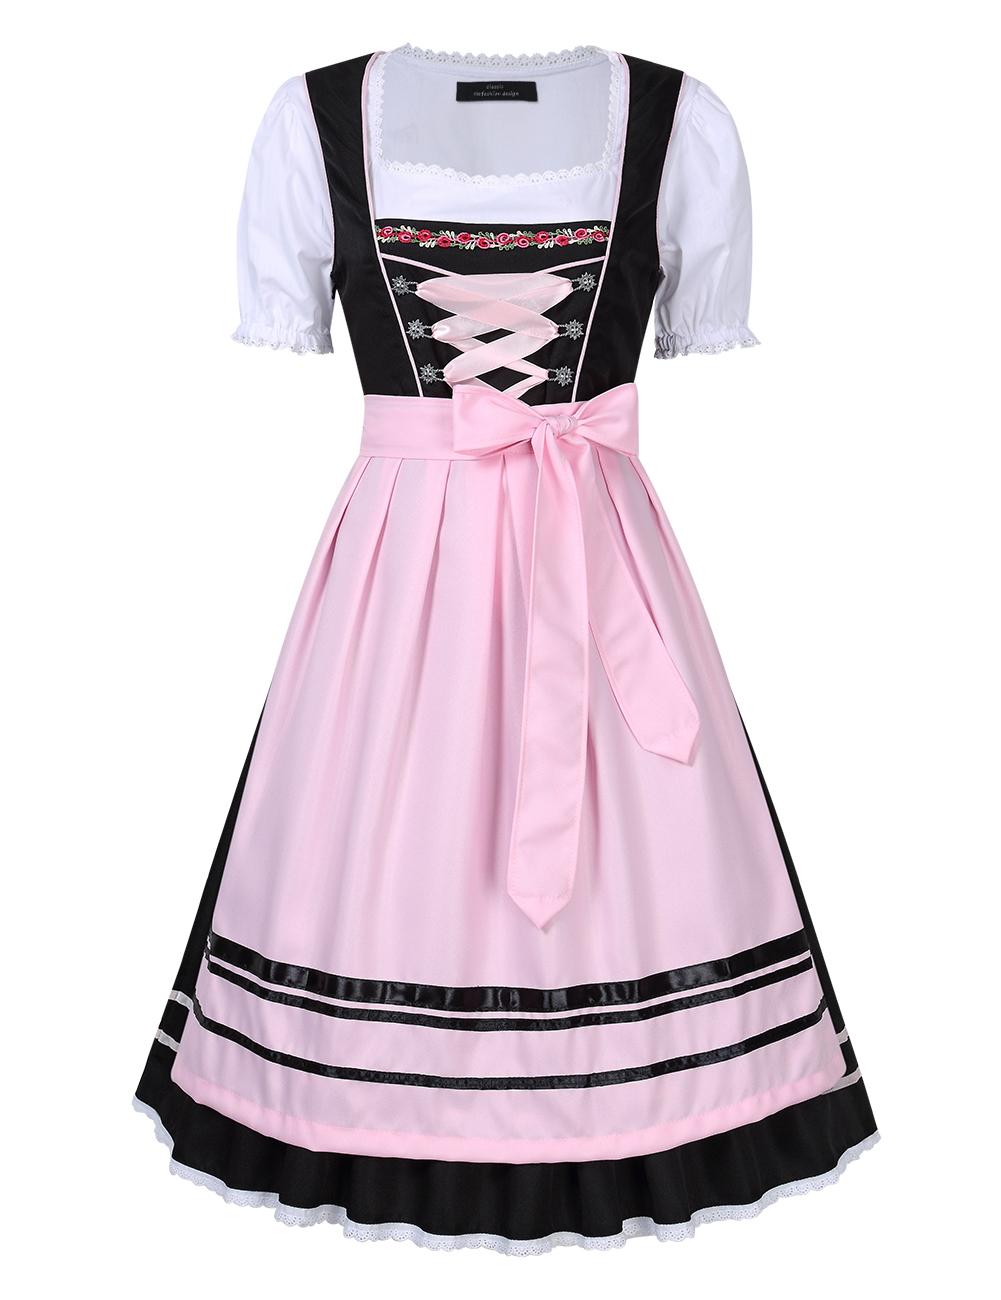 Women's Oktoberfest Holiday Three Piece Dress Suit Pleated Lace Trim Stitching Short Sleeve Dresses